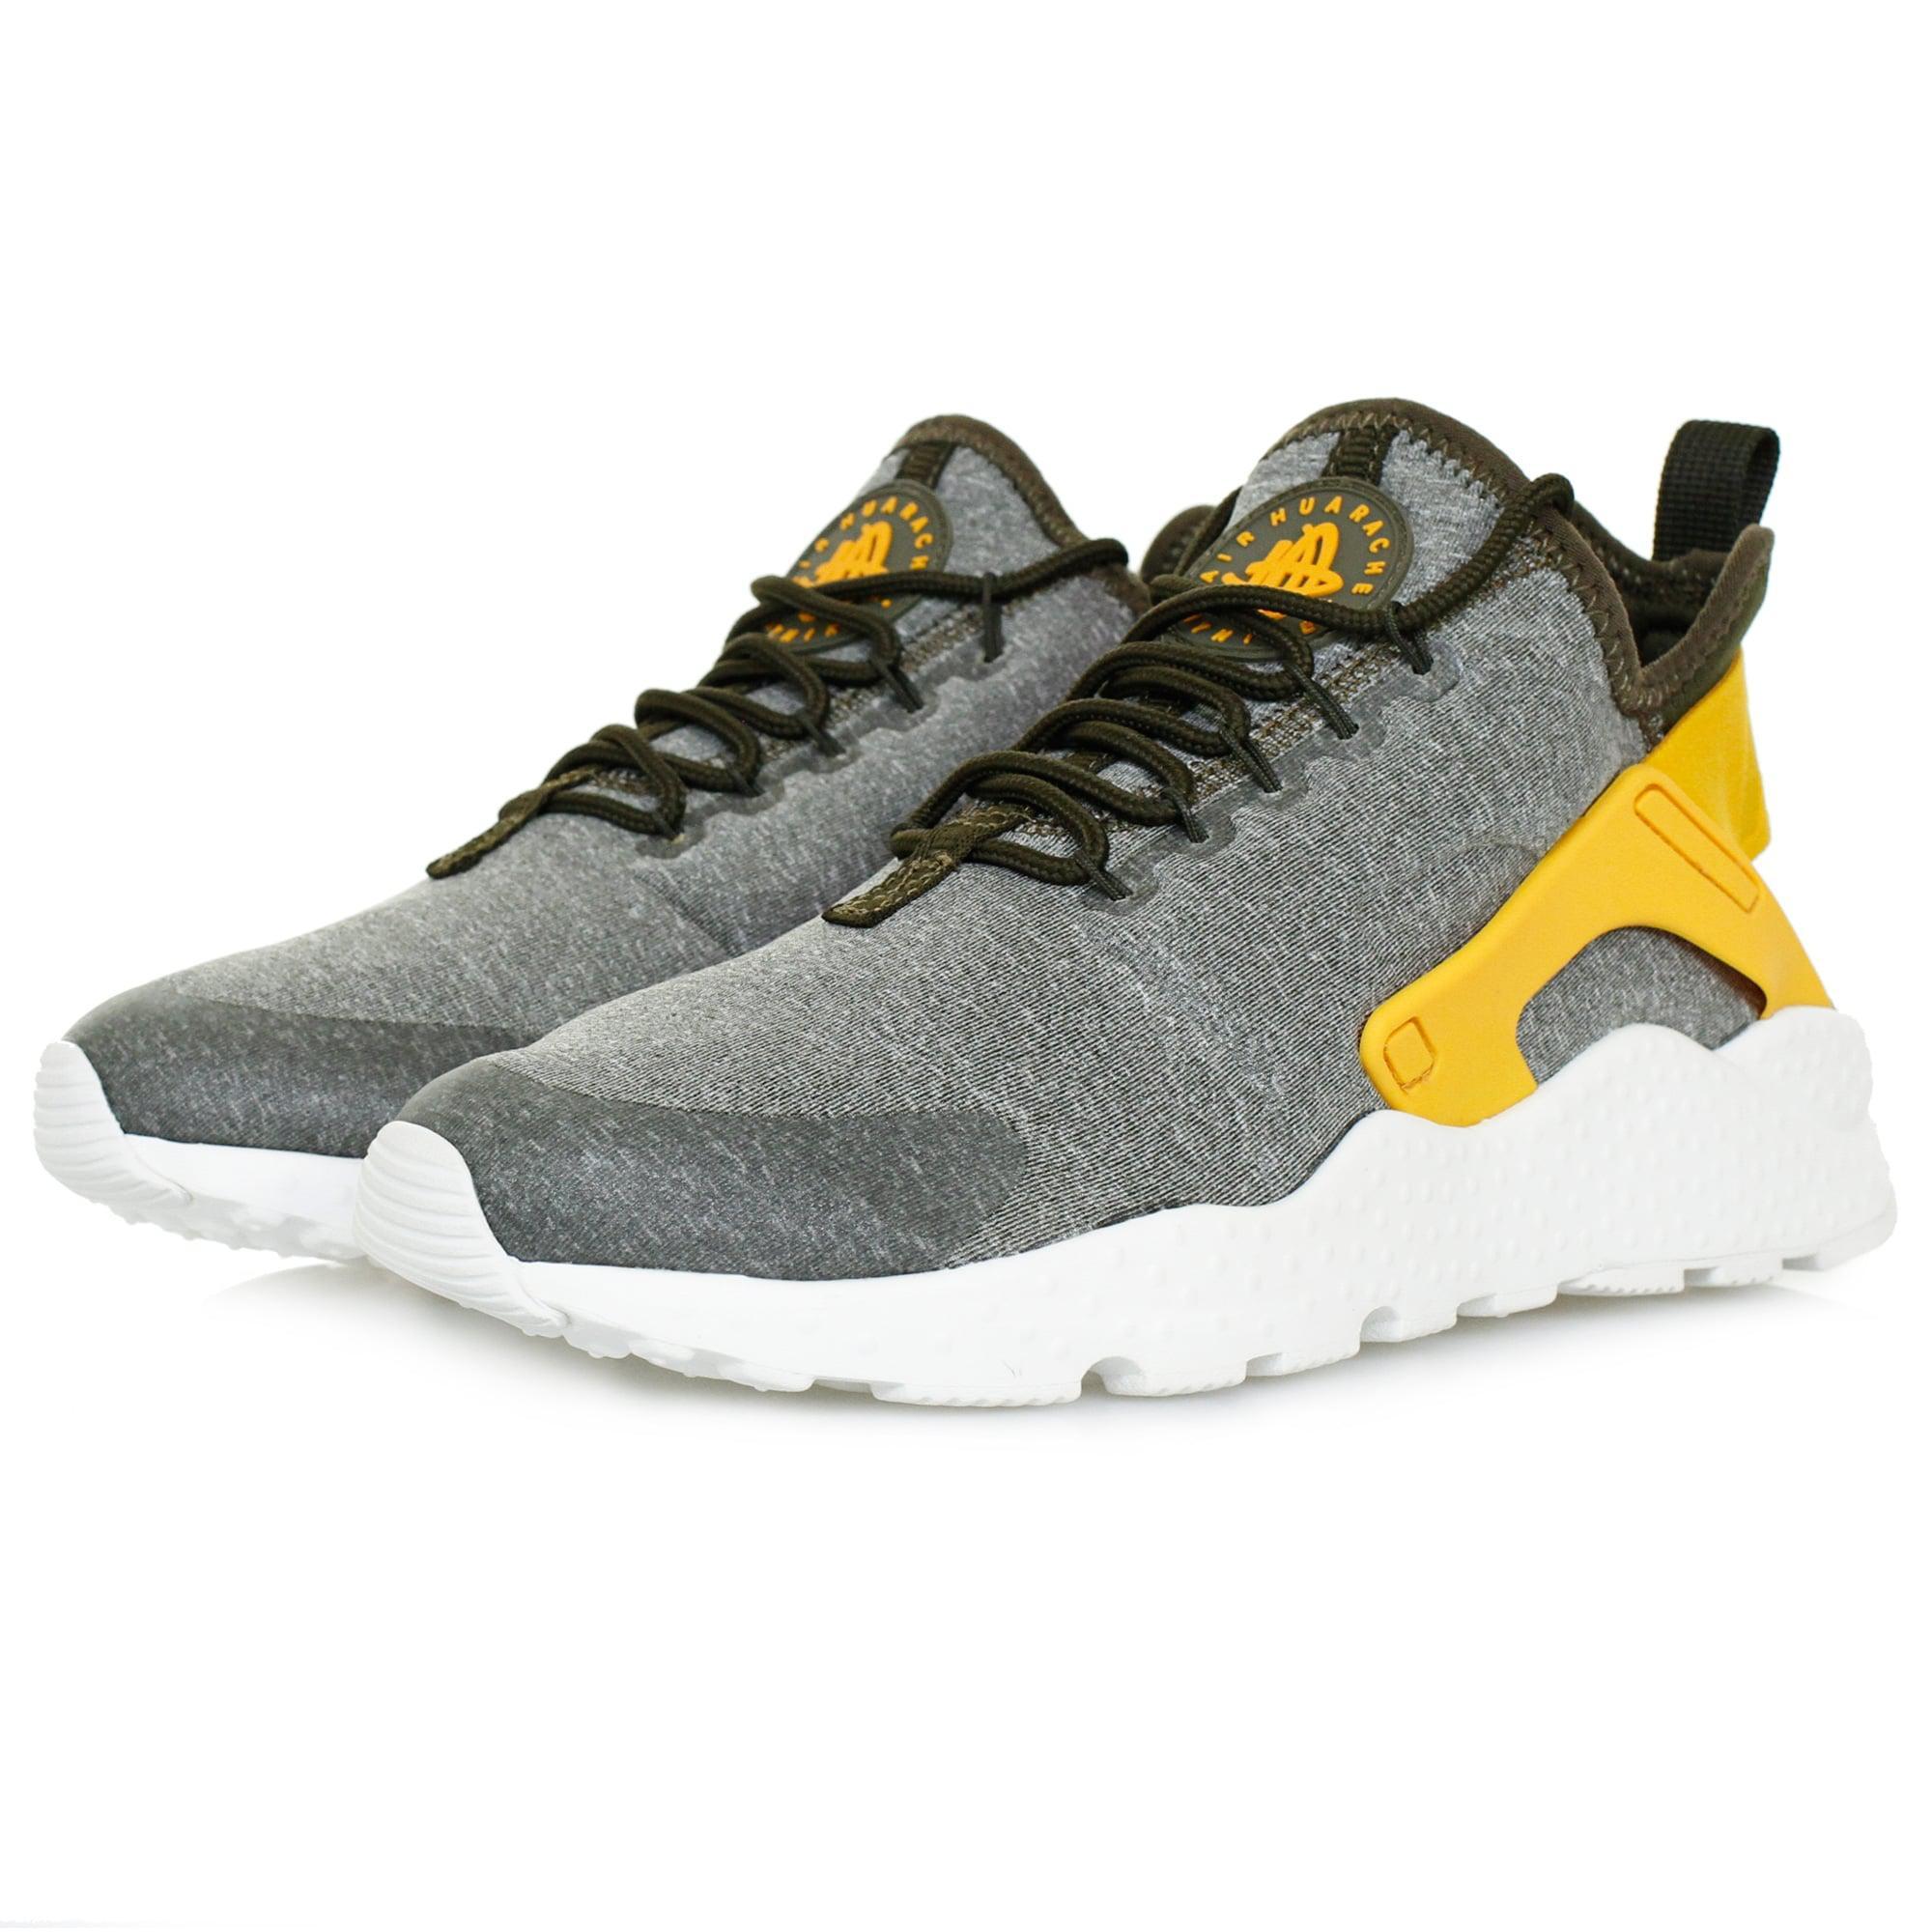 Nike Women S Air Huarache Ultra Se Dark Loden Shoe 859516300 in ... d437773518506